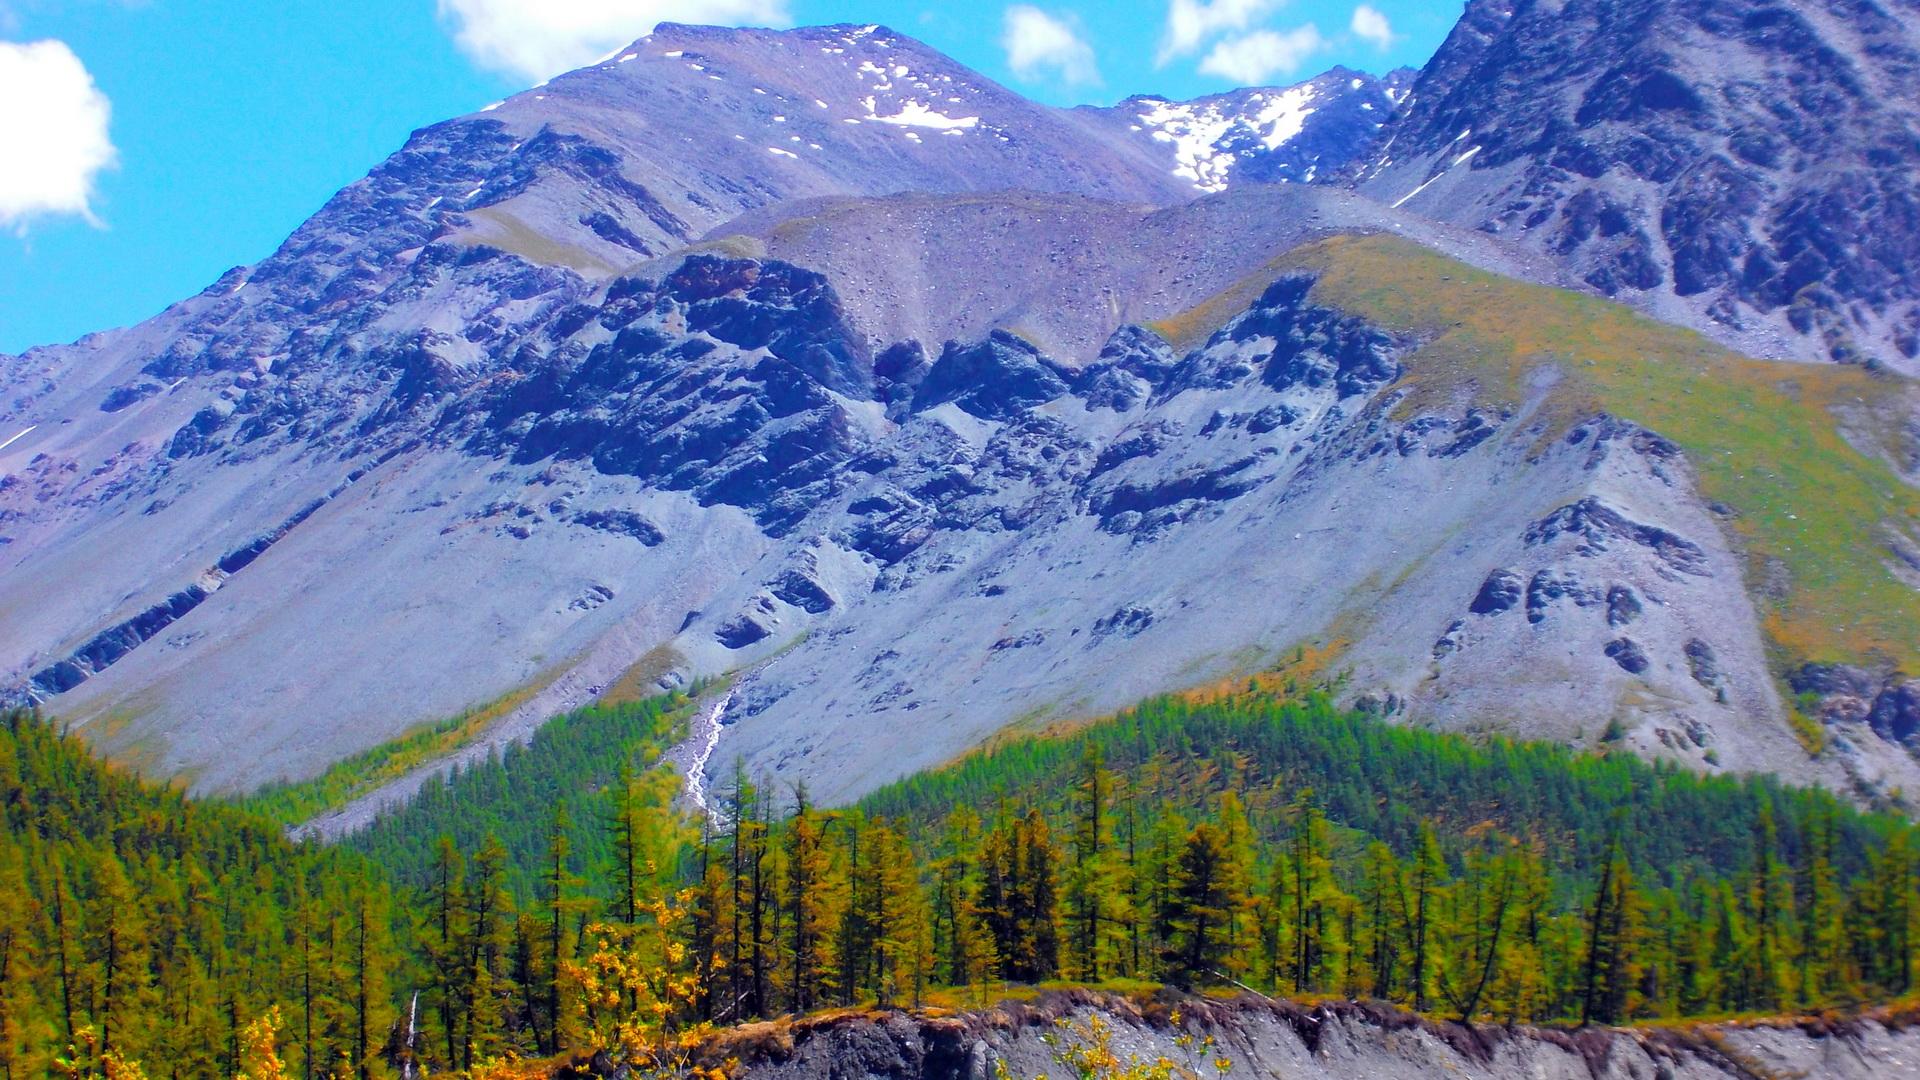 22 1 - 10 locais no Altay que vale a pena visitar